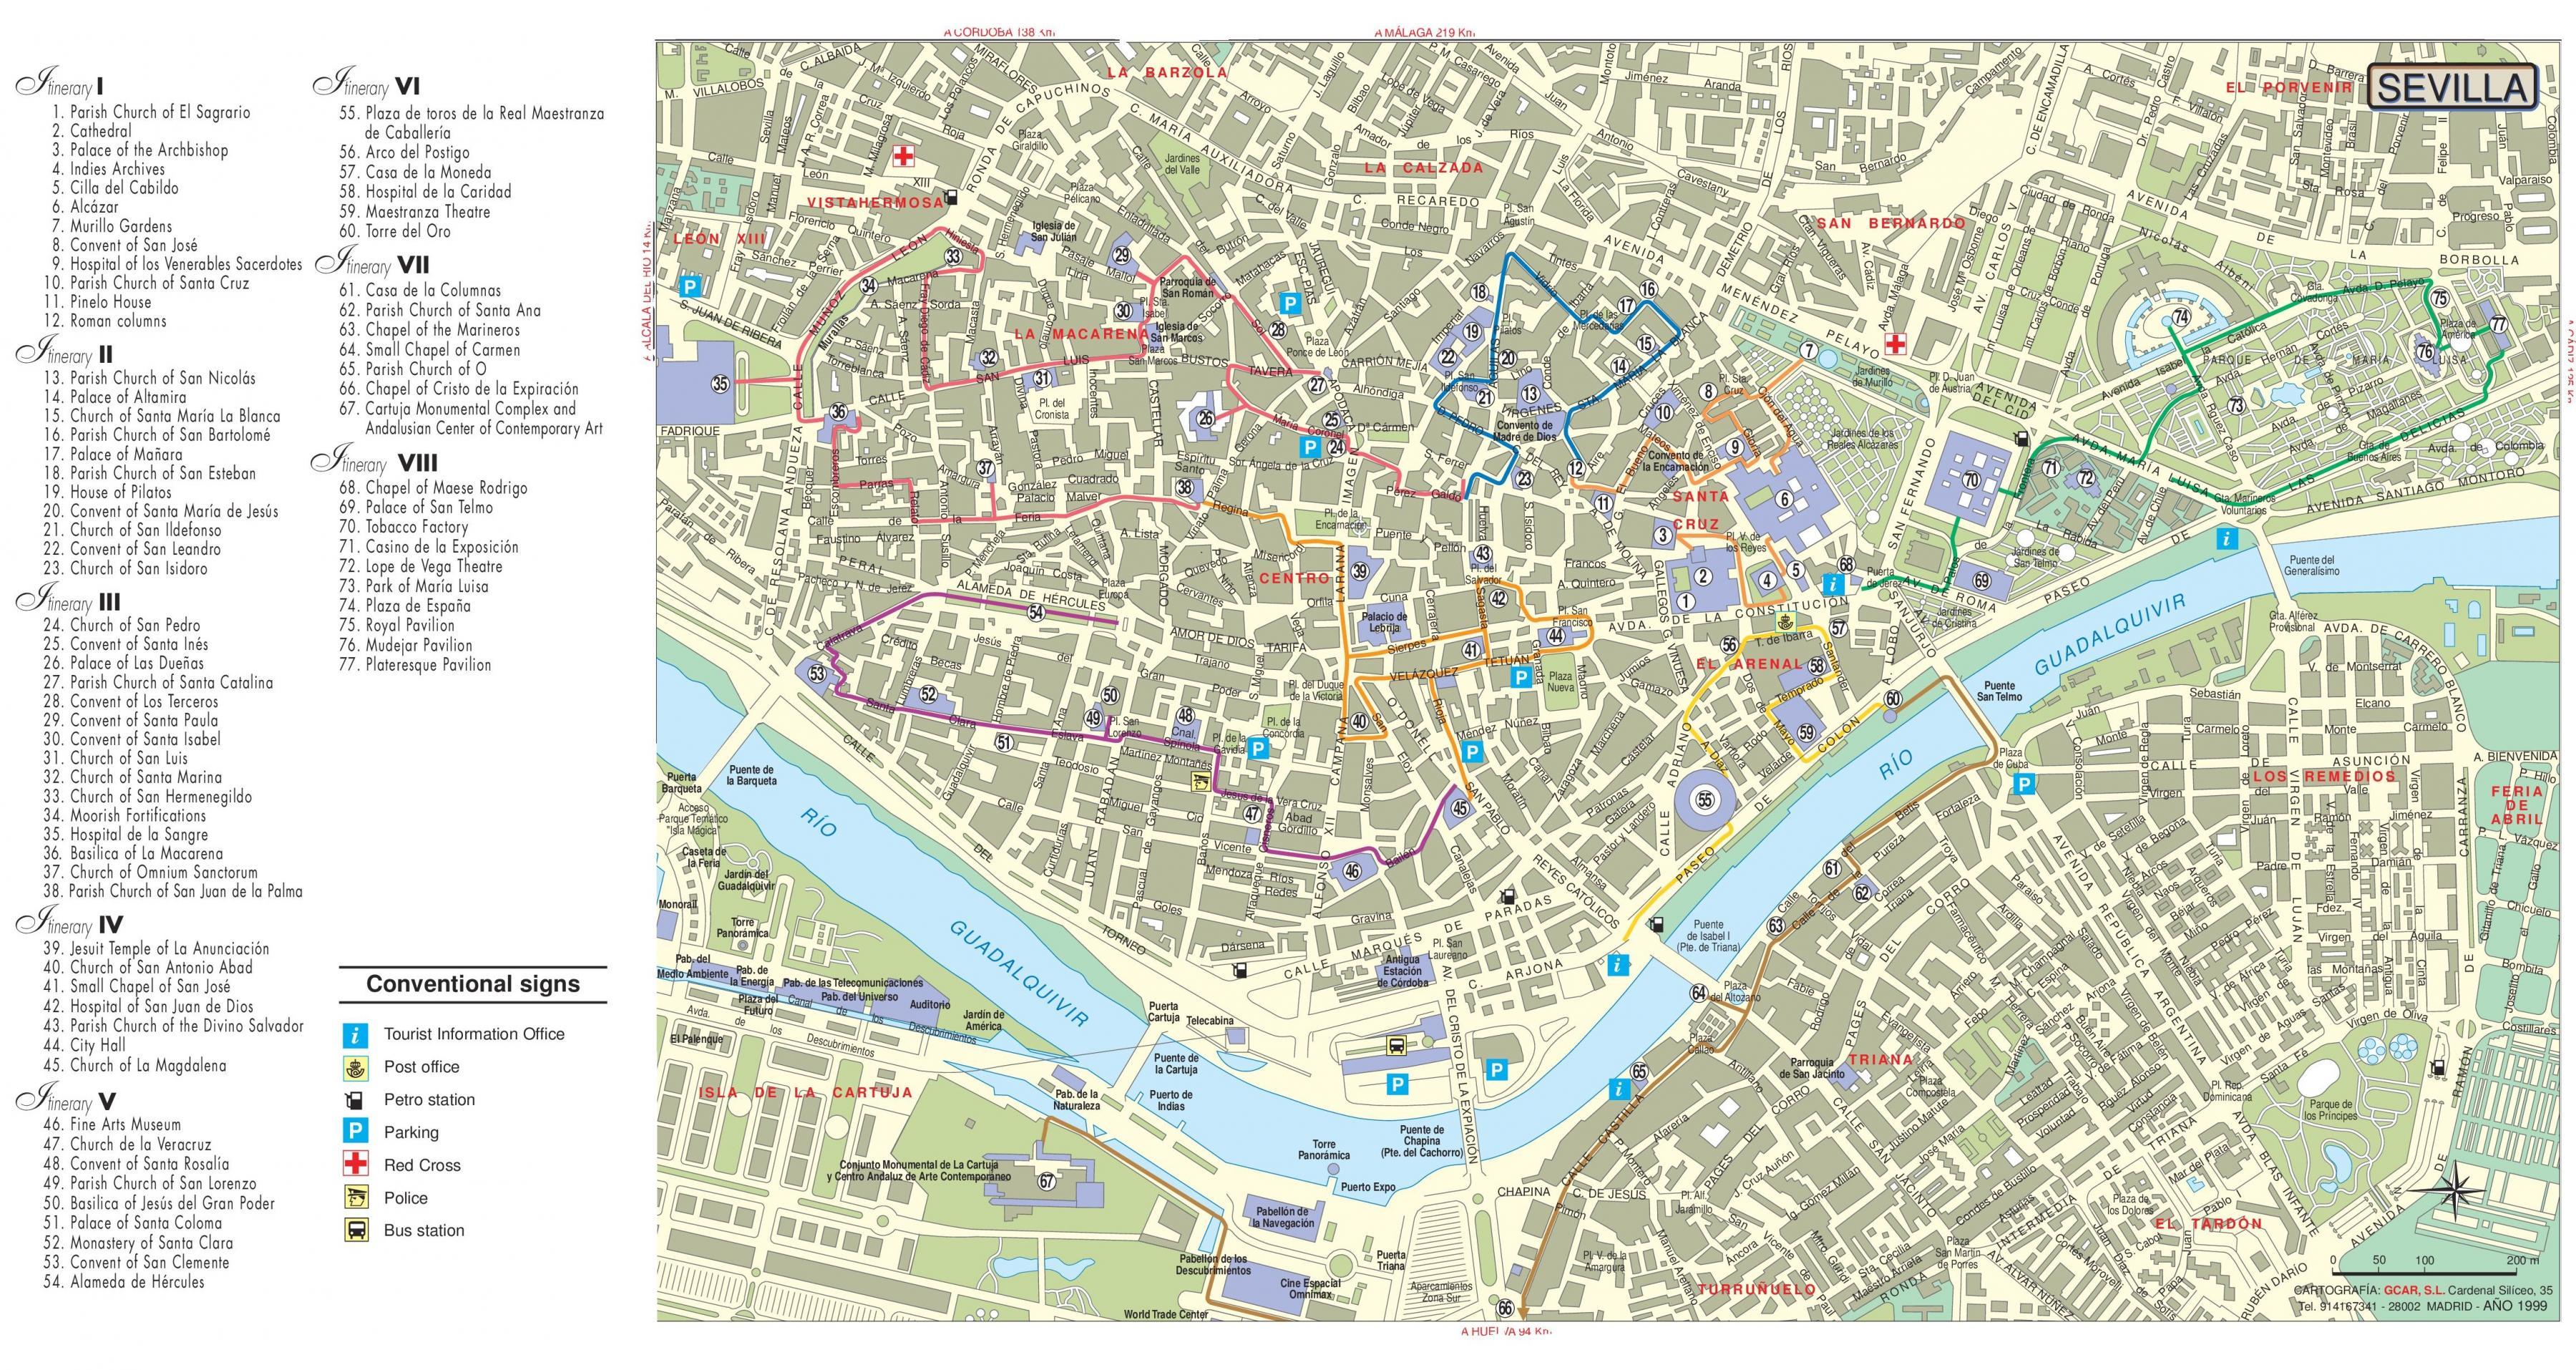 Sevilla-tourist-information-Karte - Sevilla Besichtigung Karte ...